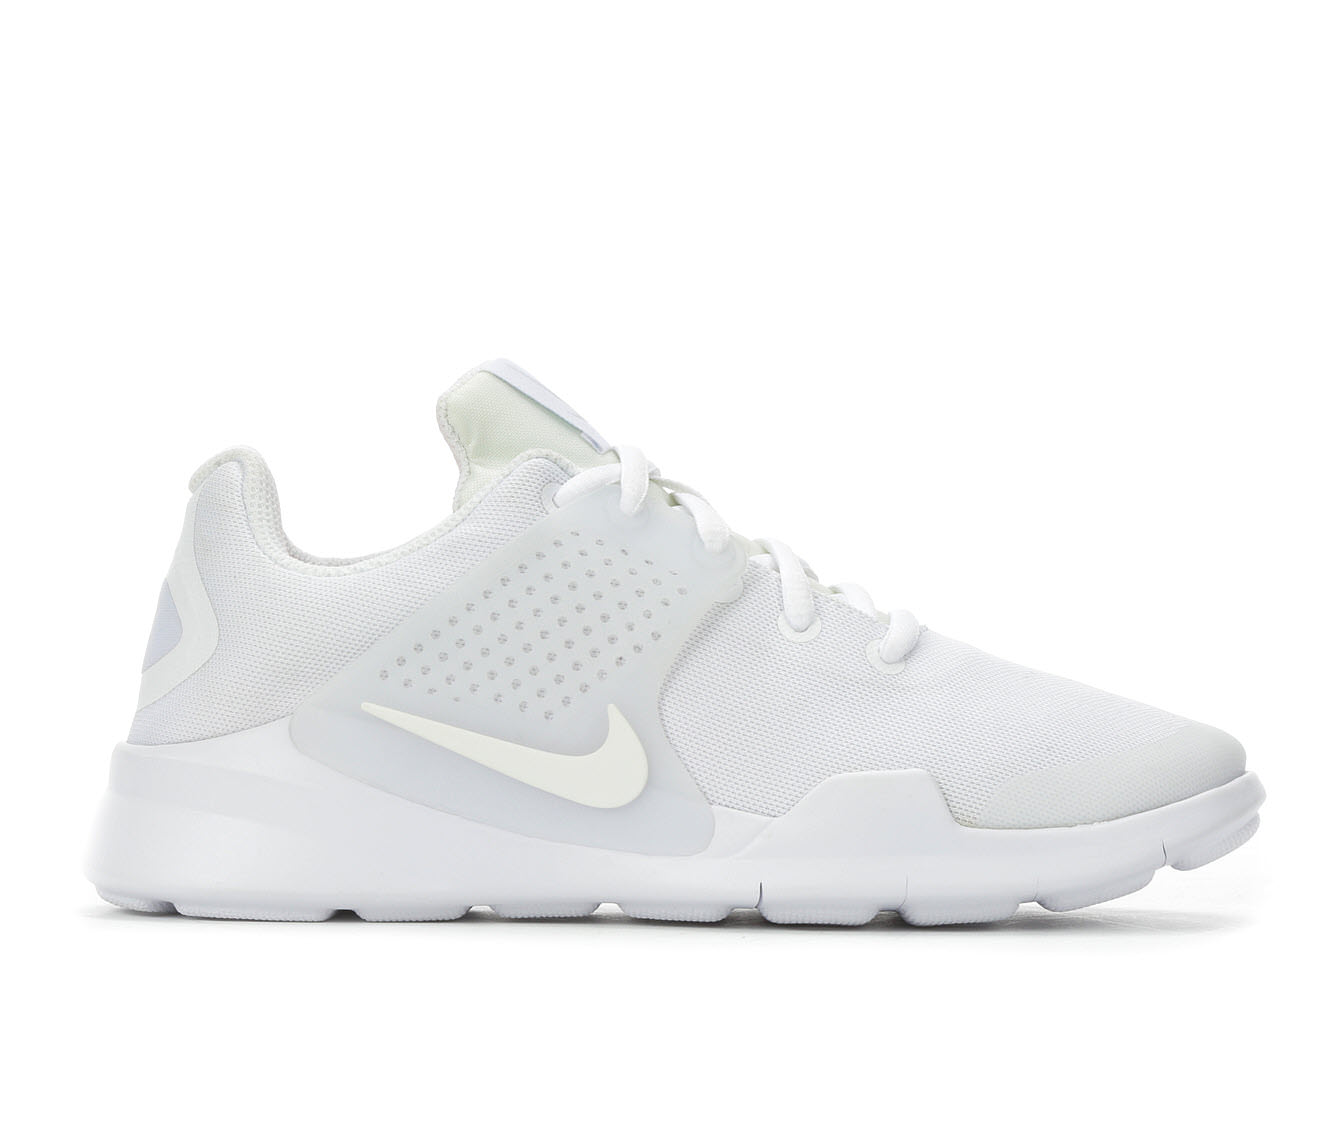 Girls' Nike Arrowz 3.5 - 7 Running Shoes (White)